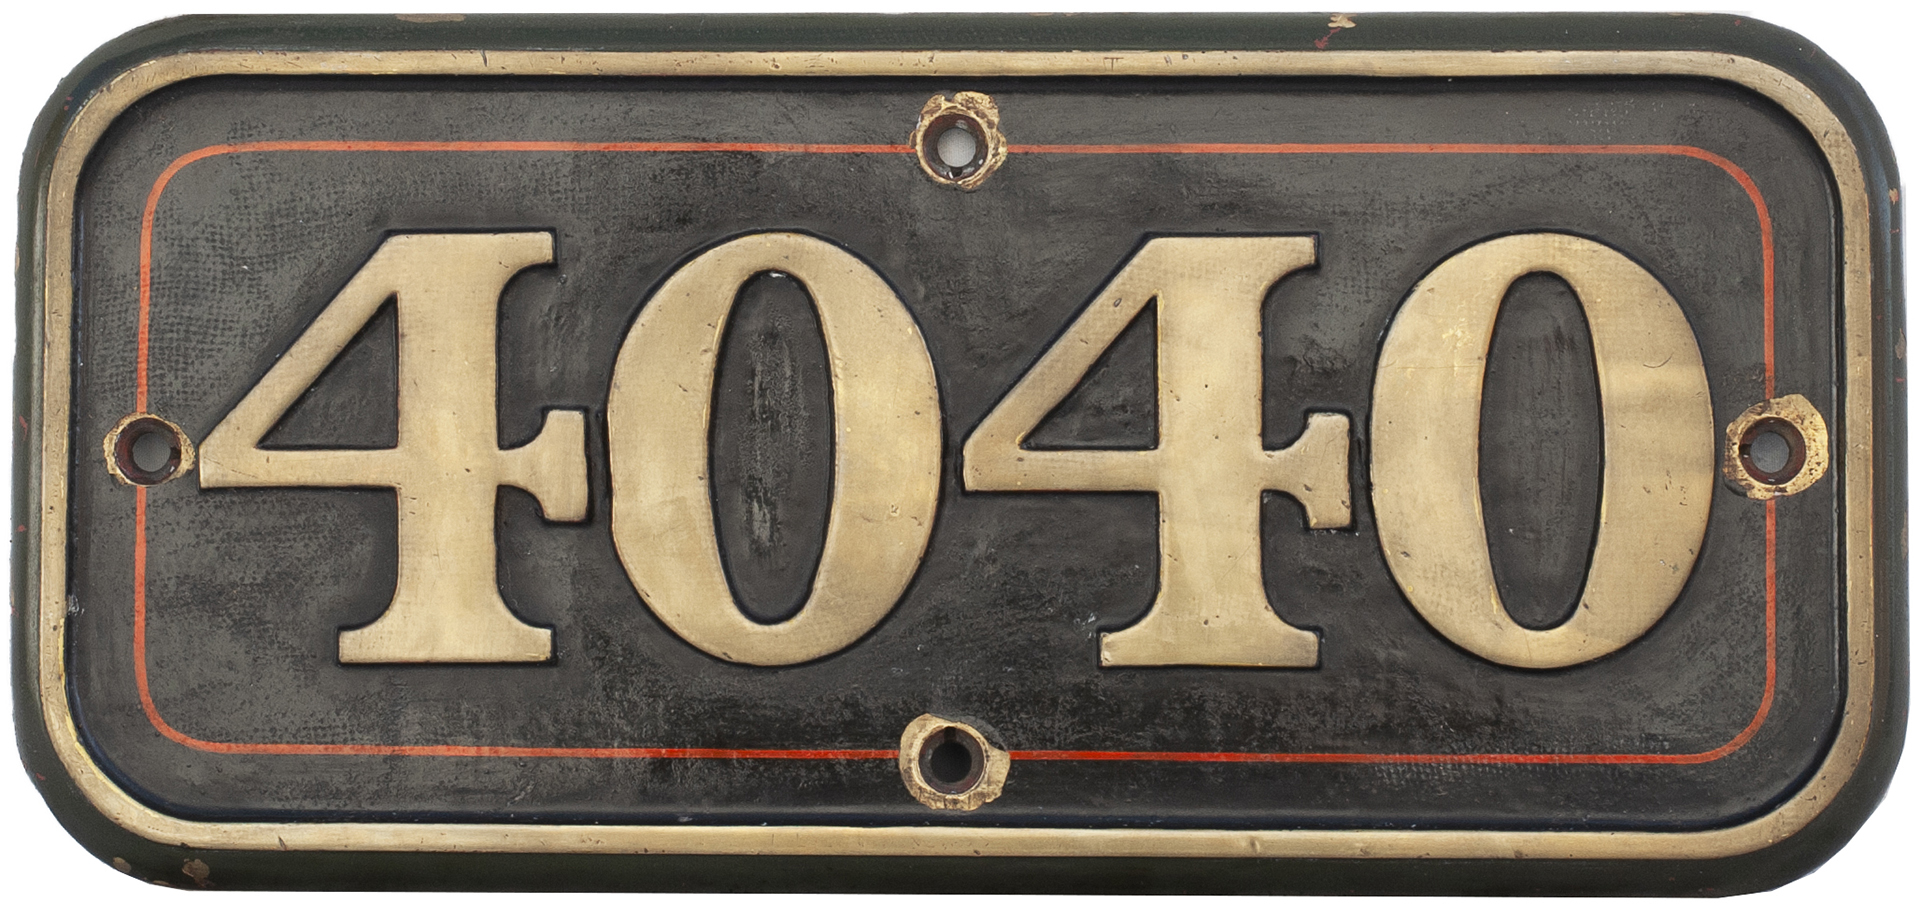 GWR Brass Cabside Numberplate 4040 Ex Churchward